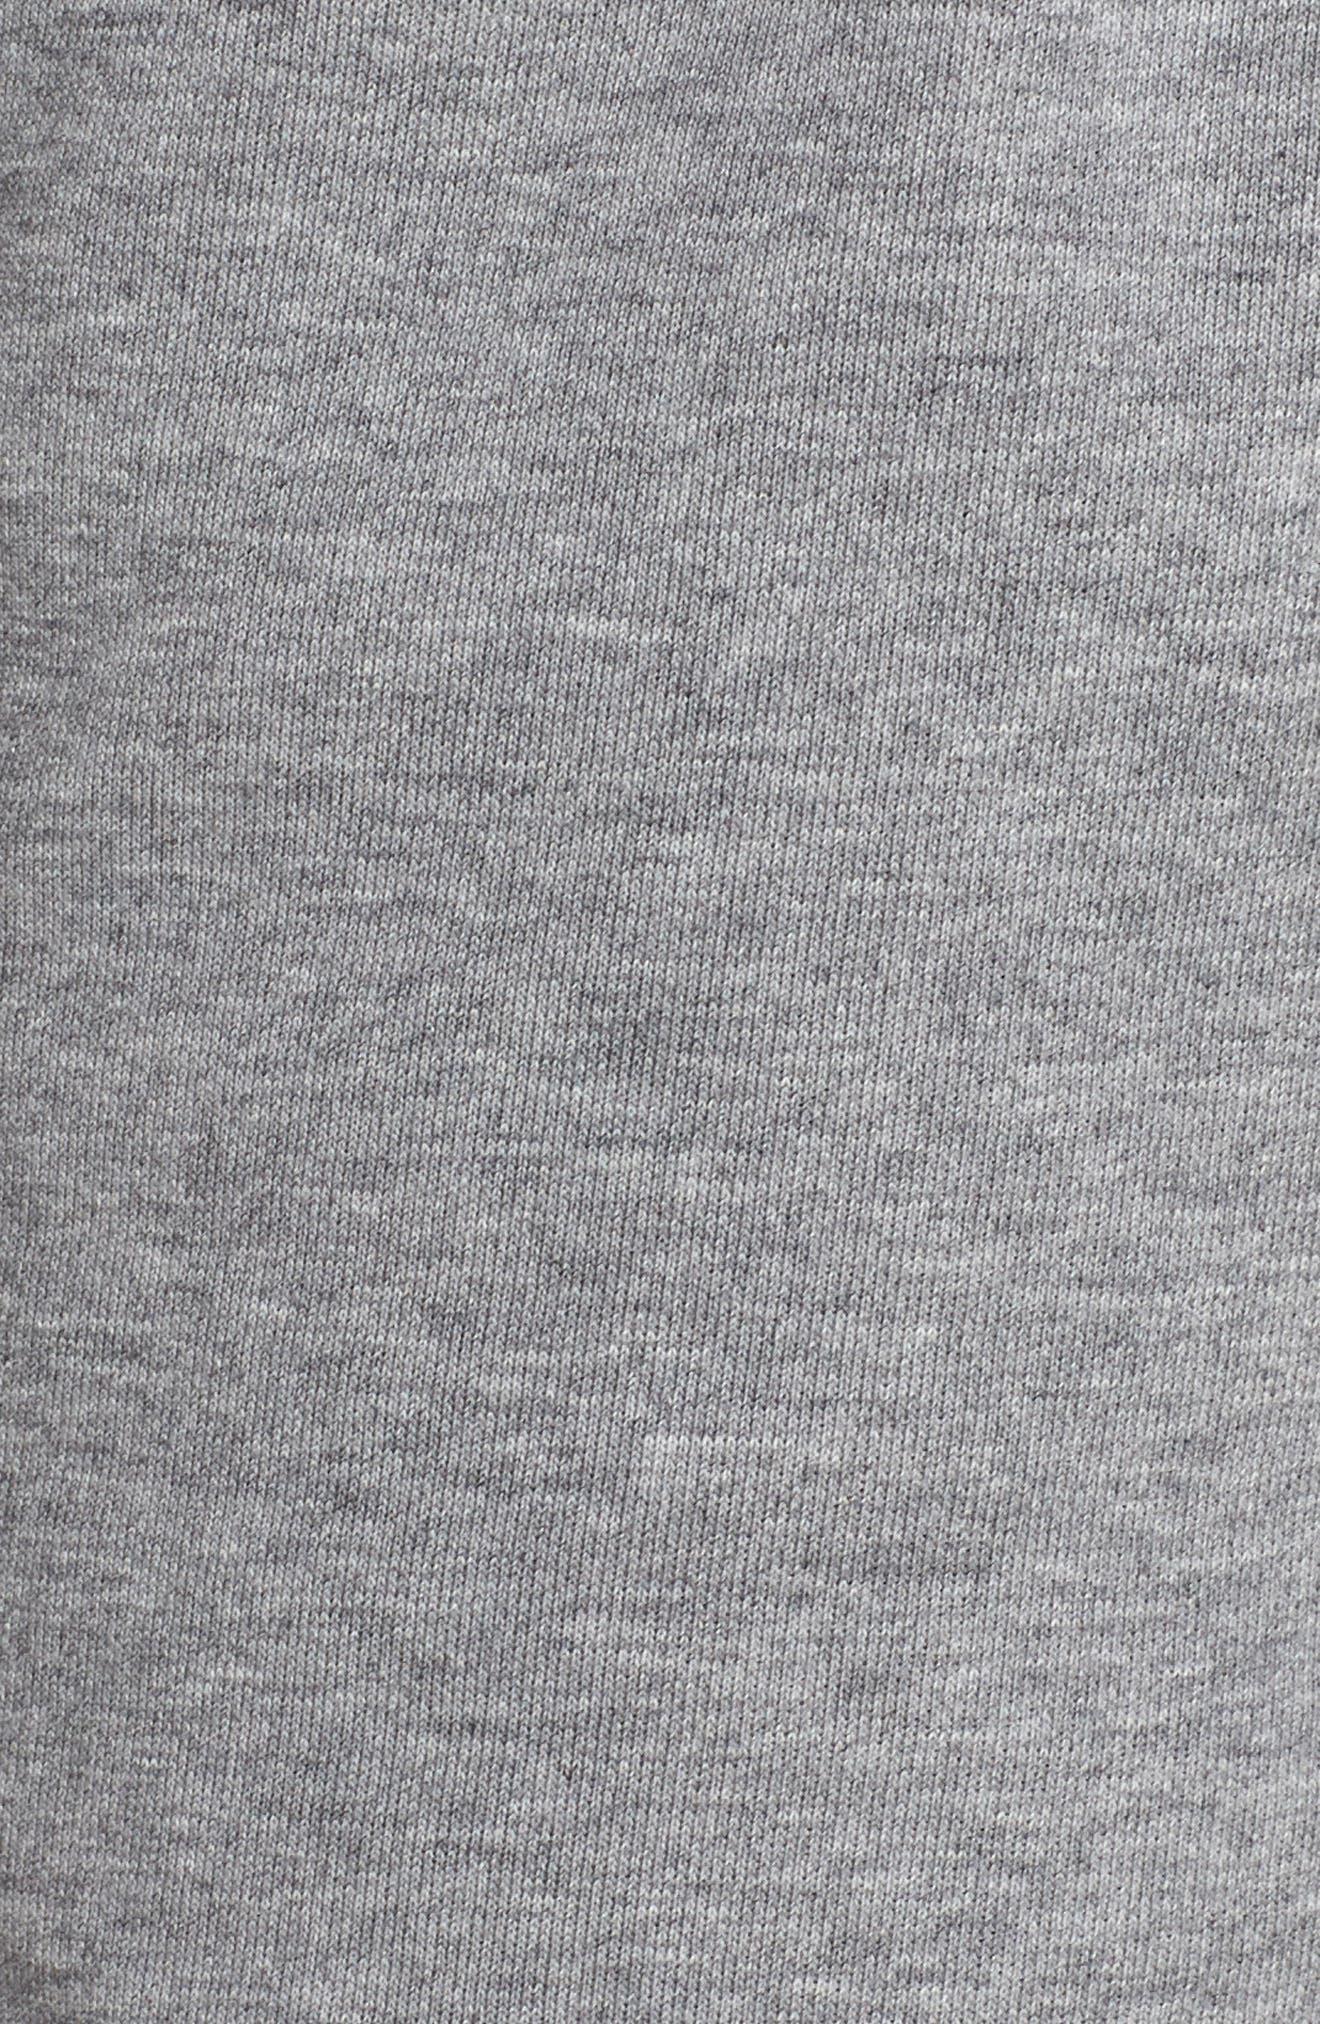 Sportswear Air Gym Shorts,                             Alternate thumbnail 7, color,                             Carbon Heather/ White/ Black